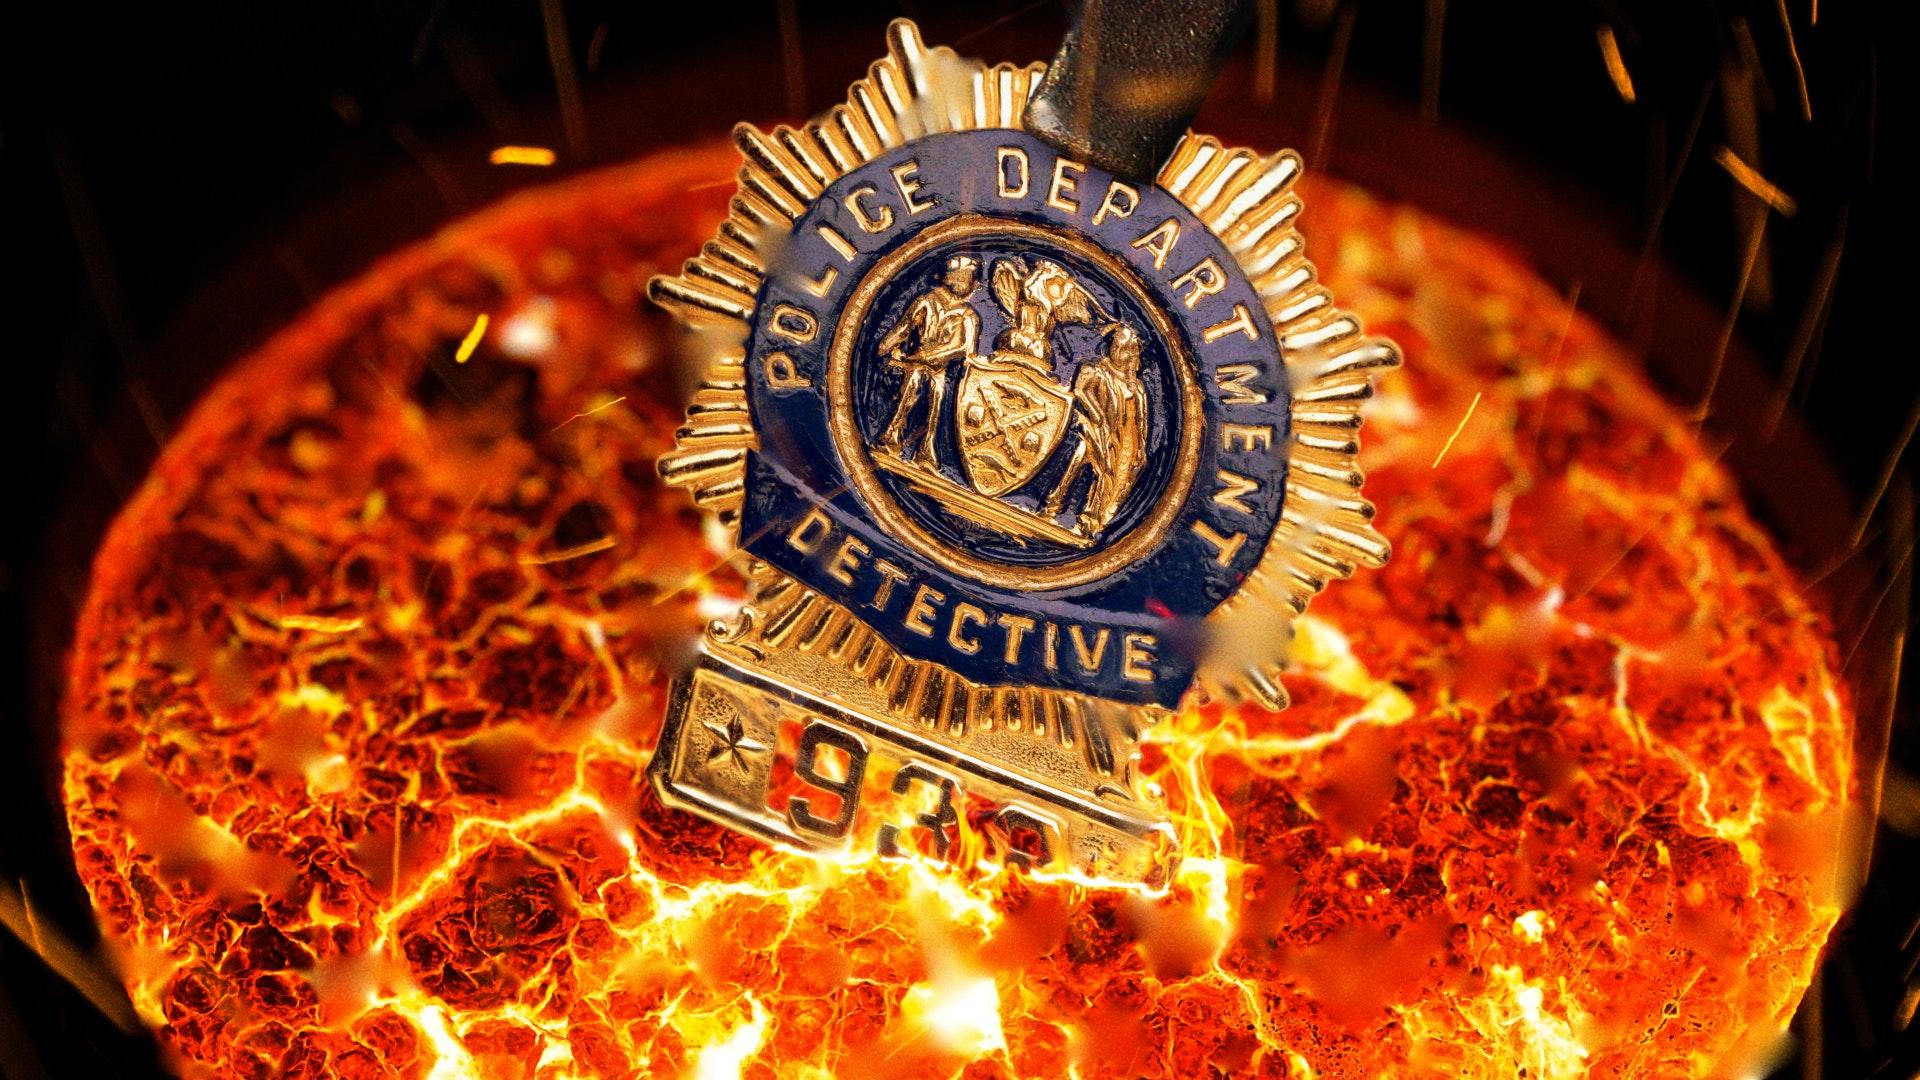 Ep. 1235 - Abolish The Police?!